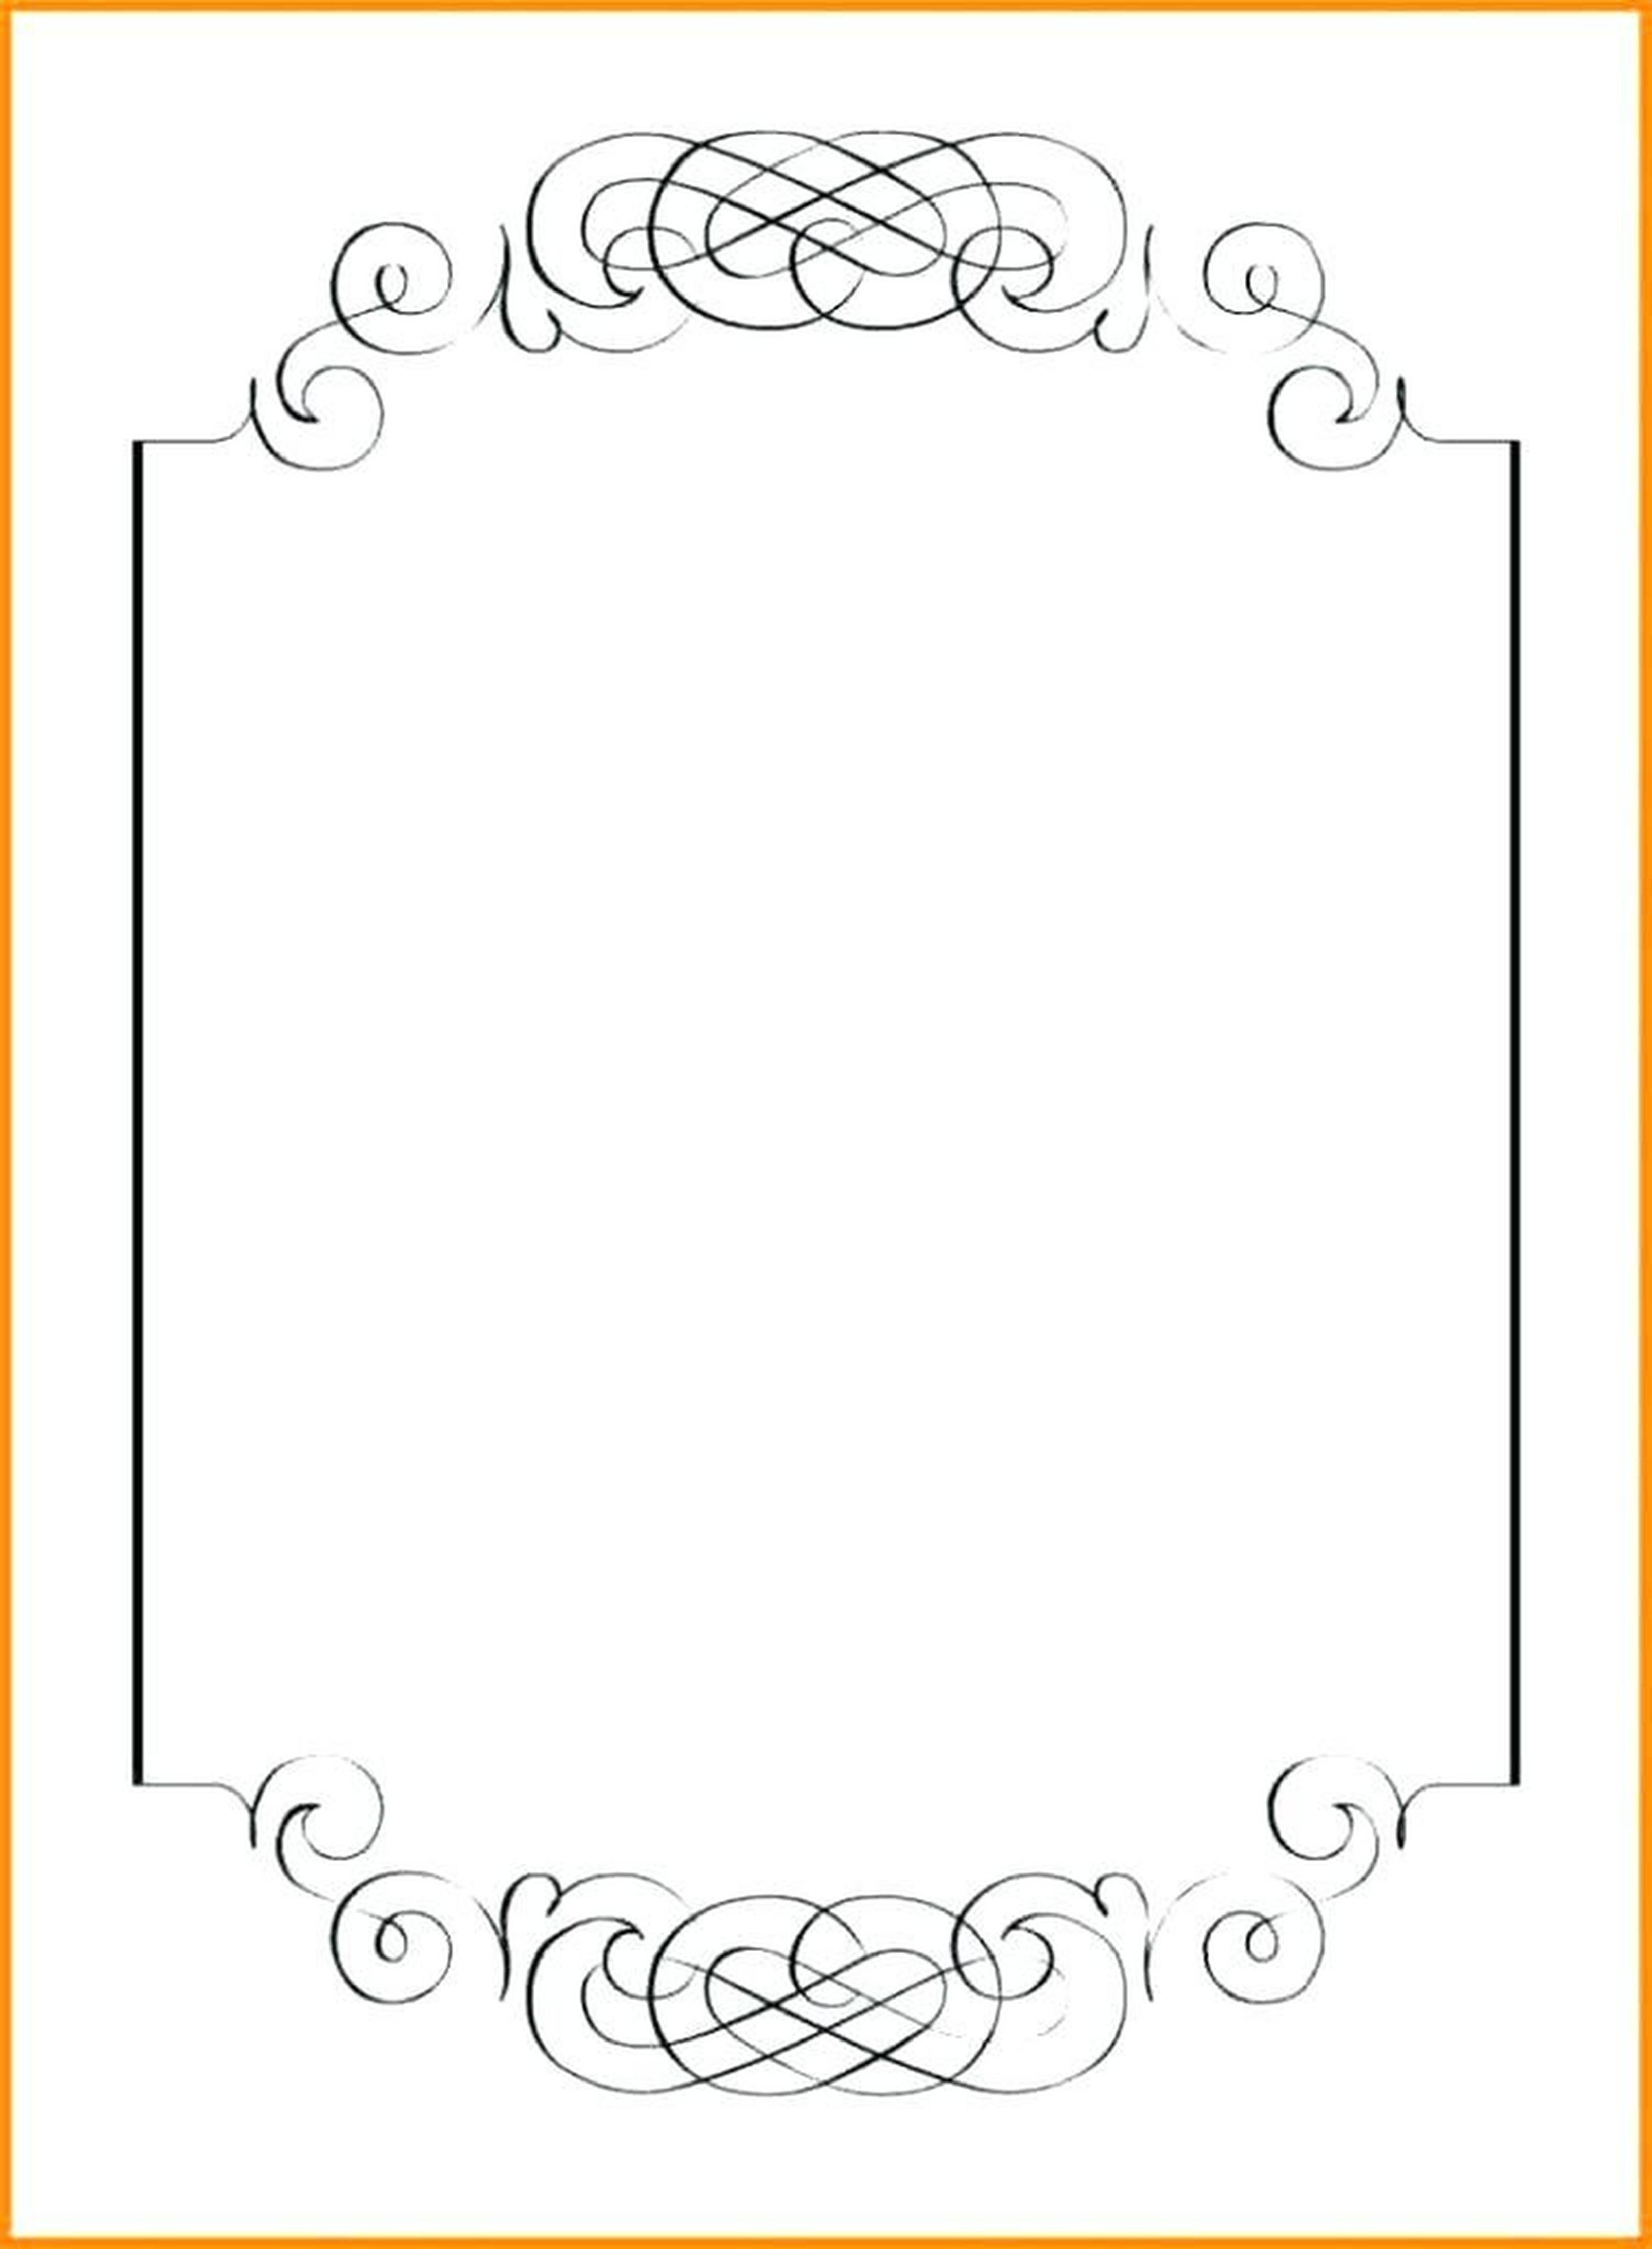 20+ Free Wedding Invitation Templates Printables | Wedding - Free Printable Wedding Invitation Templates For Word